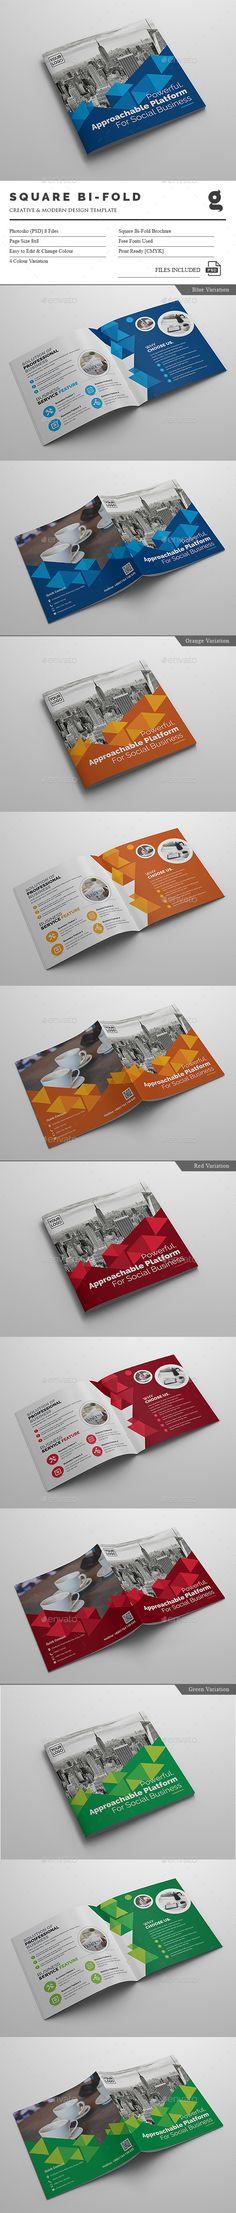 Square Bi-Fold Brochure Template PSD. Download here: http://graphicriver.net/item/square-bifold-brochure/15864115?ref=ksioks